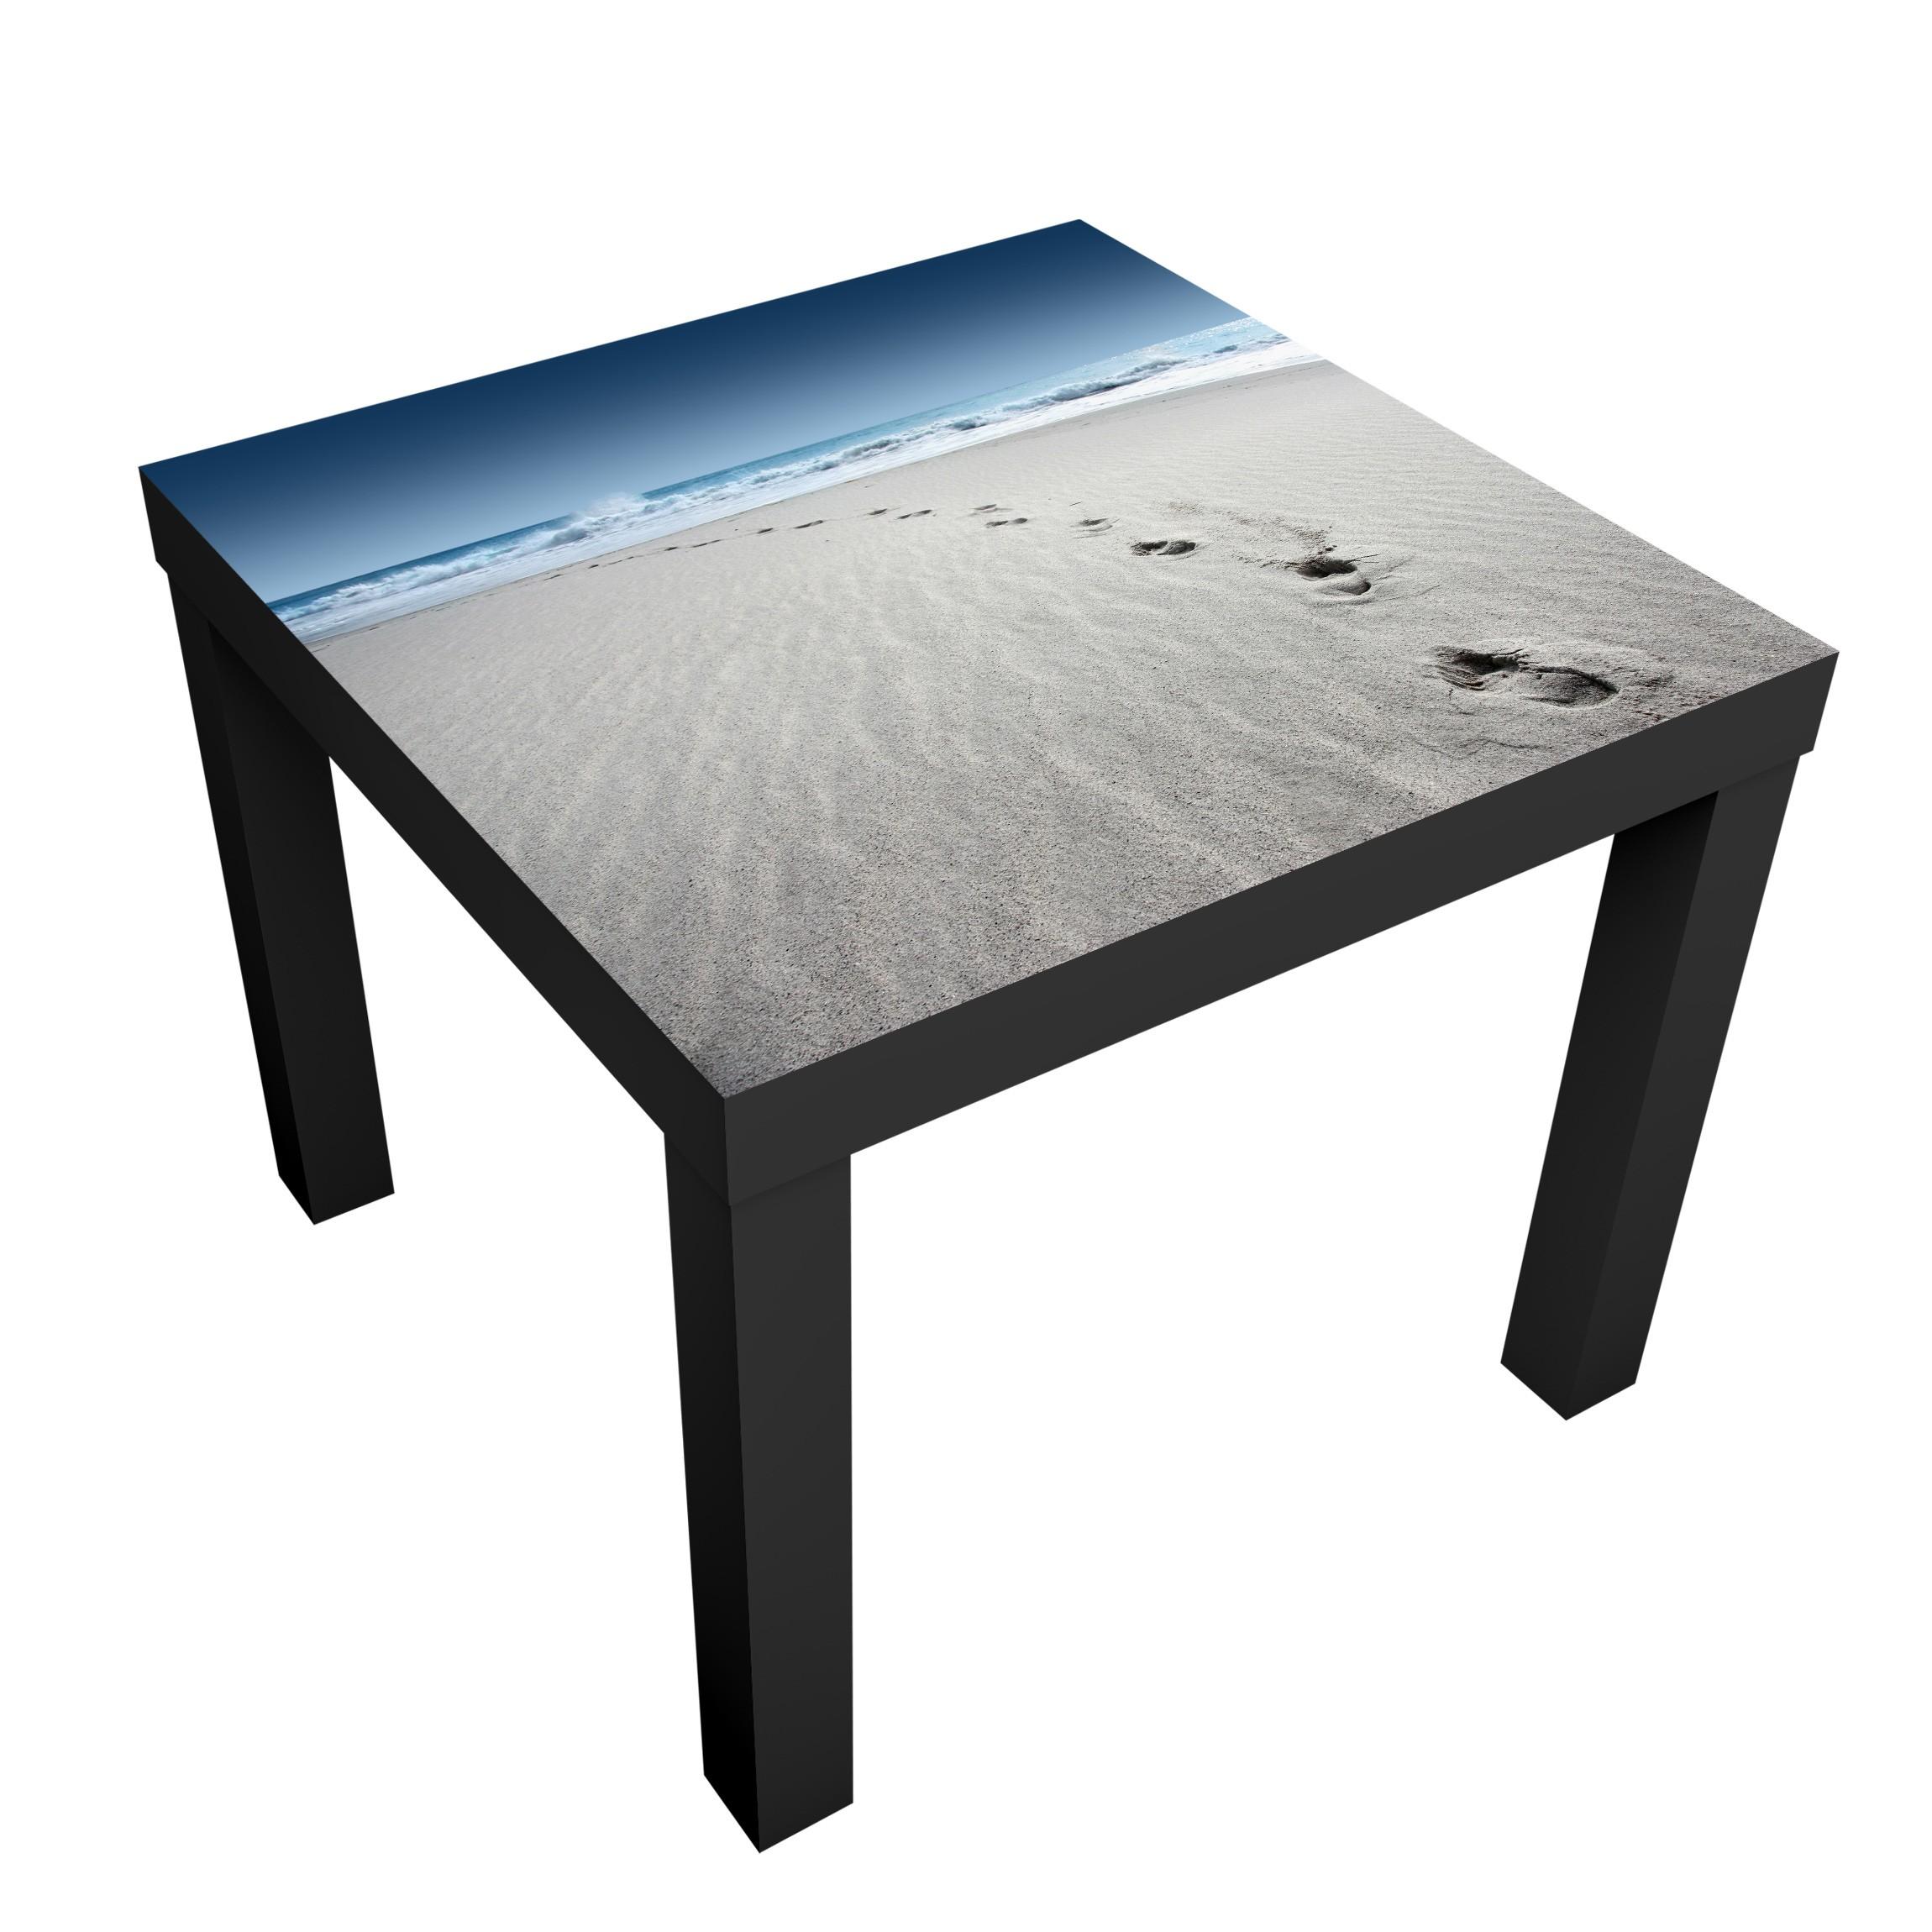 Carta Per Mobili : Carta adesiva per mobili ikea lack tavolino footprints